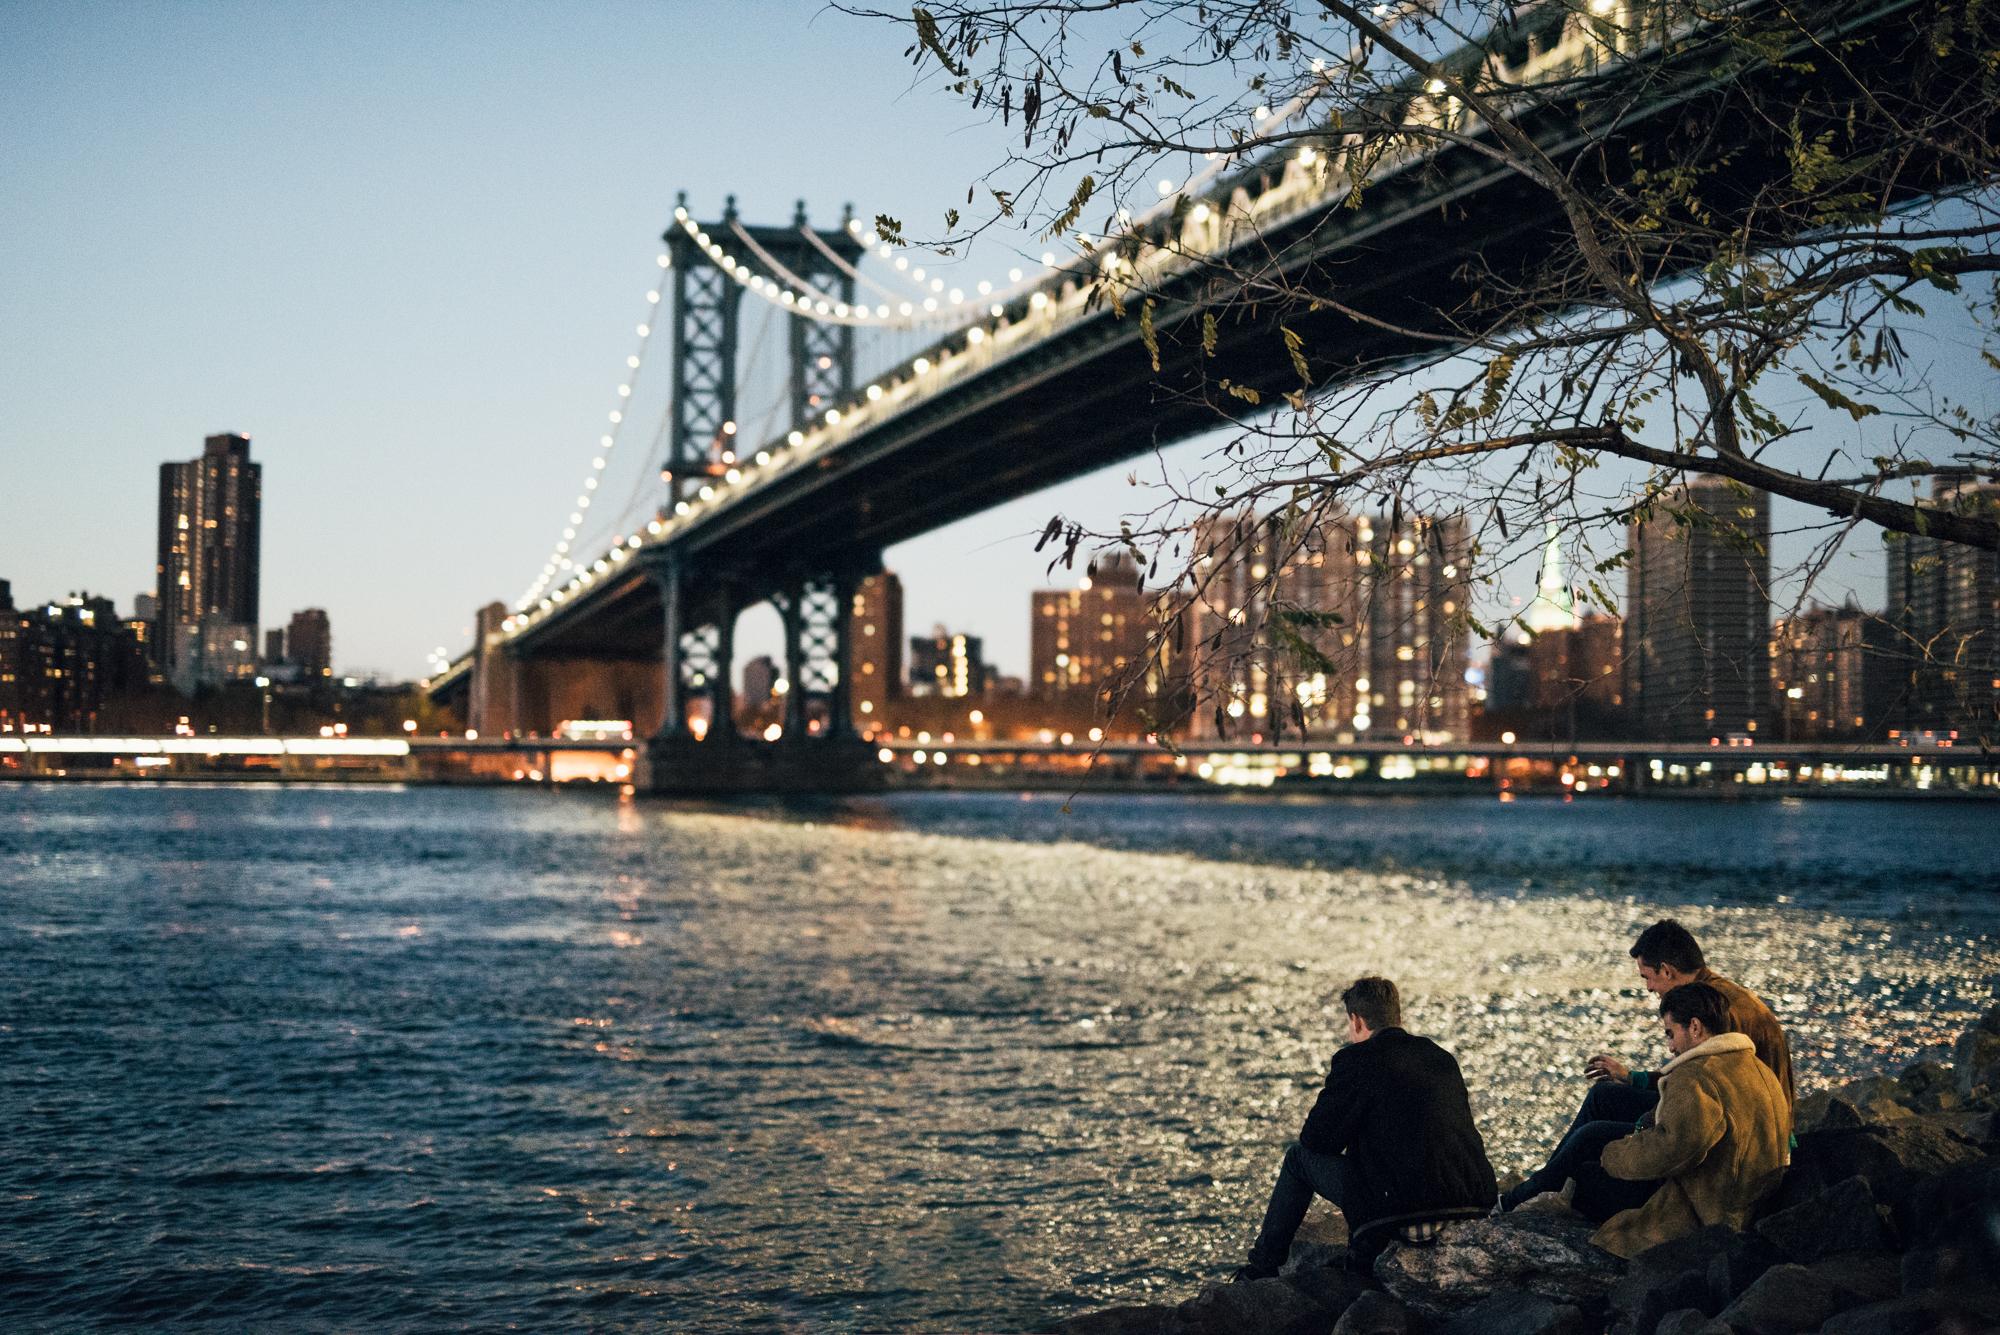 ©The Ryans Photography - NYC Night-009.jpg